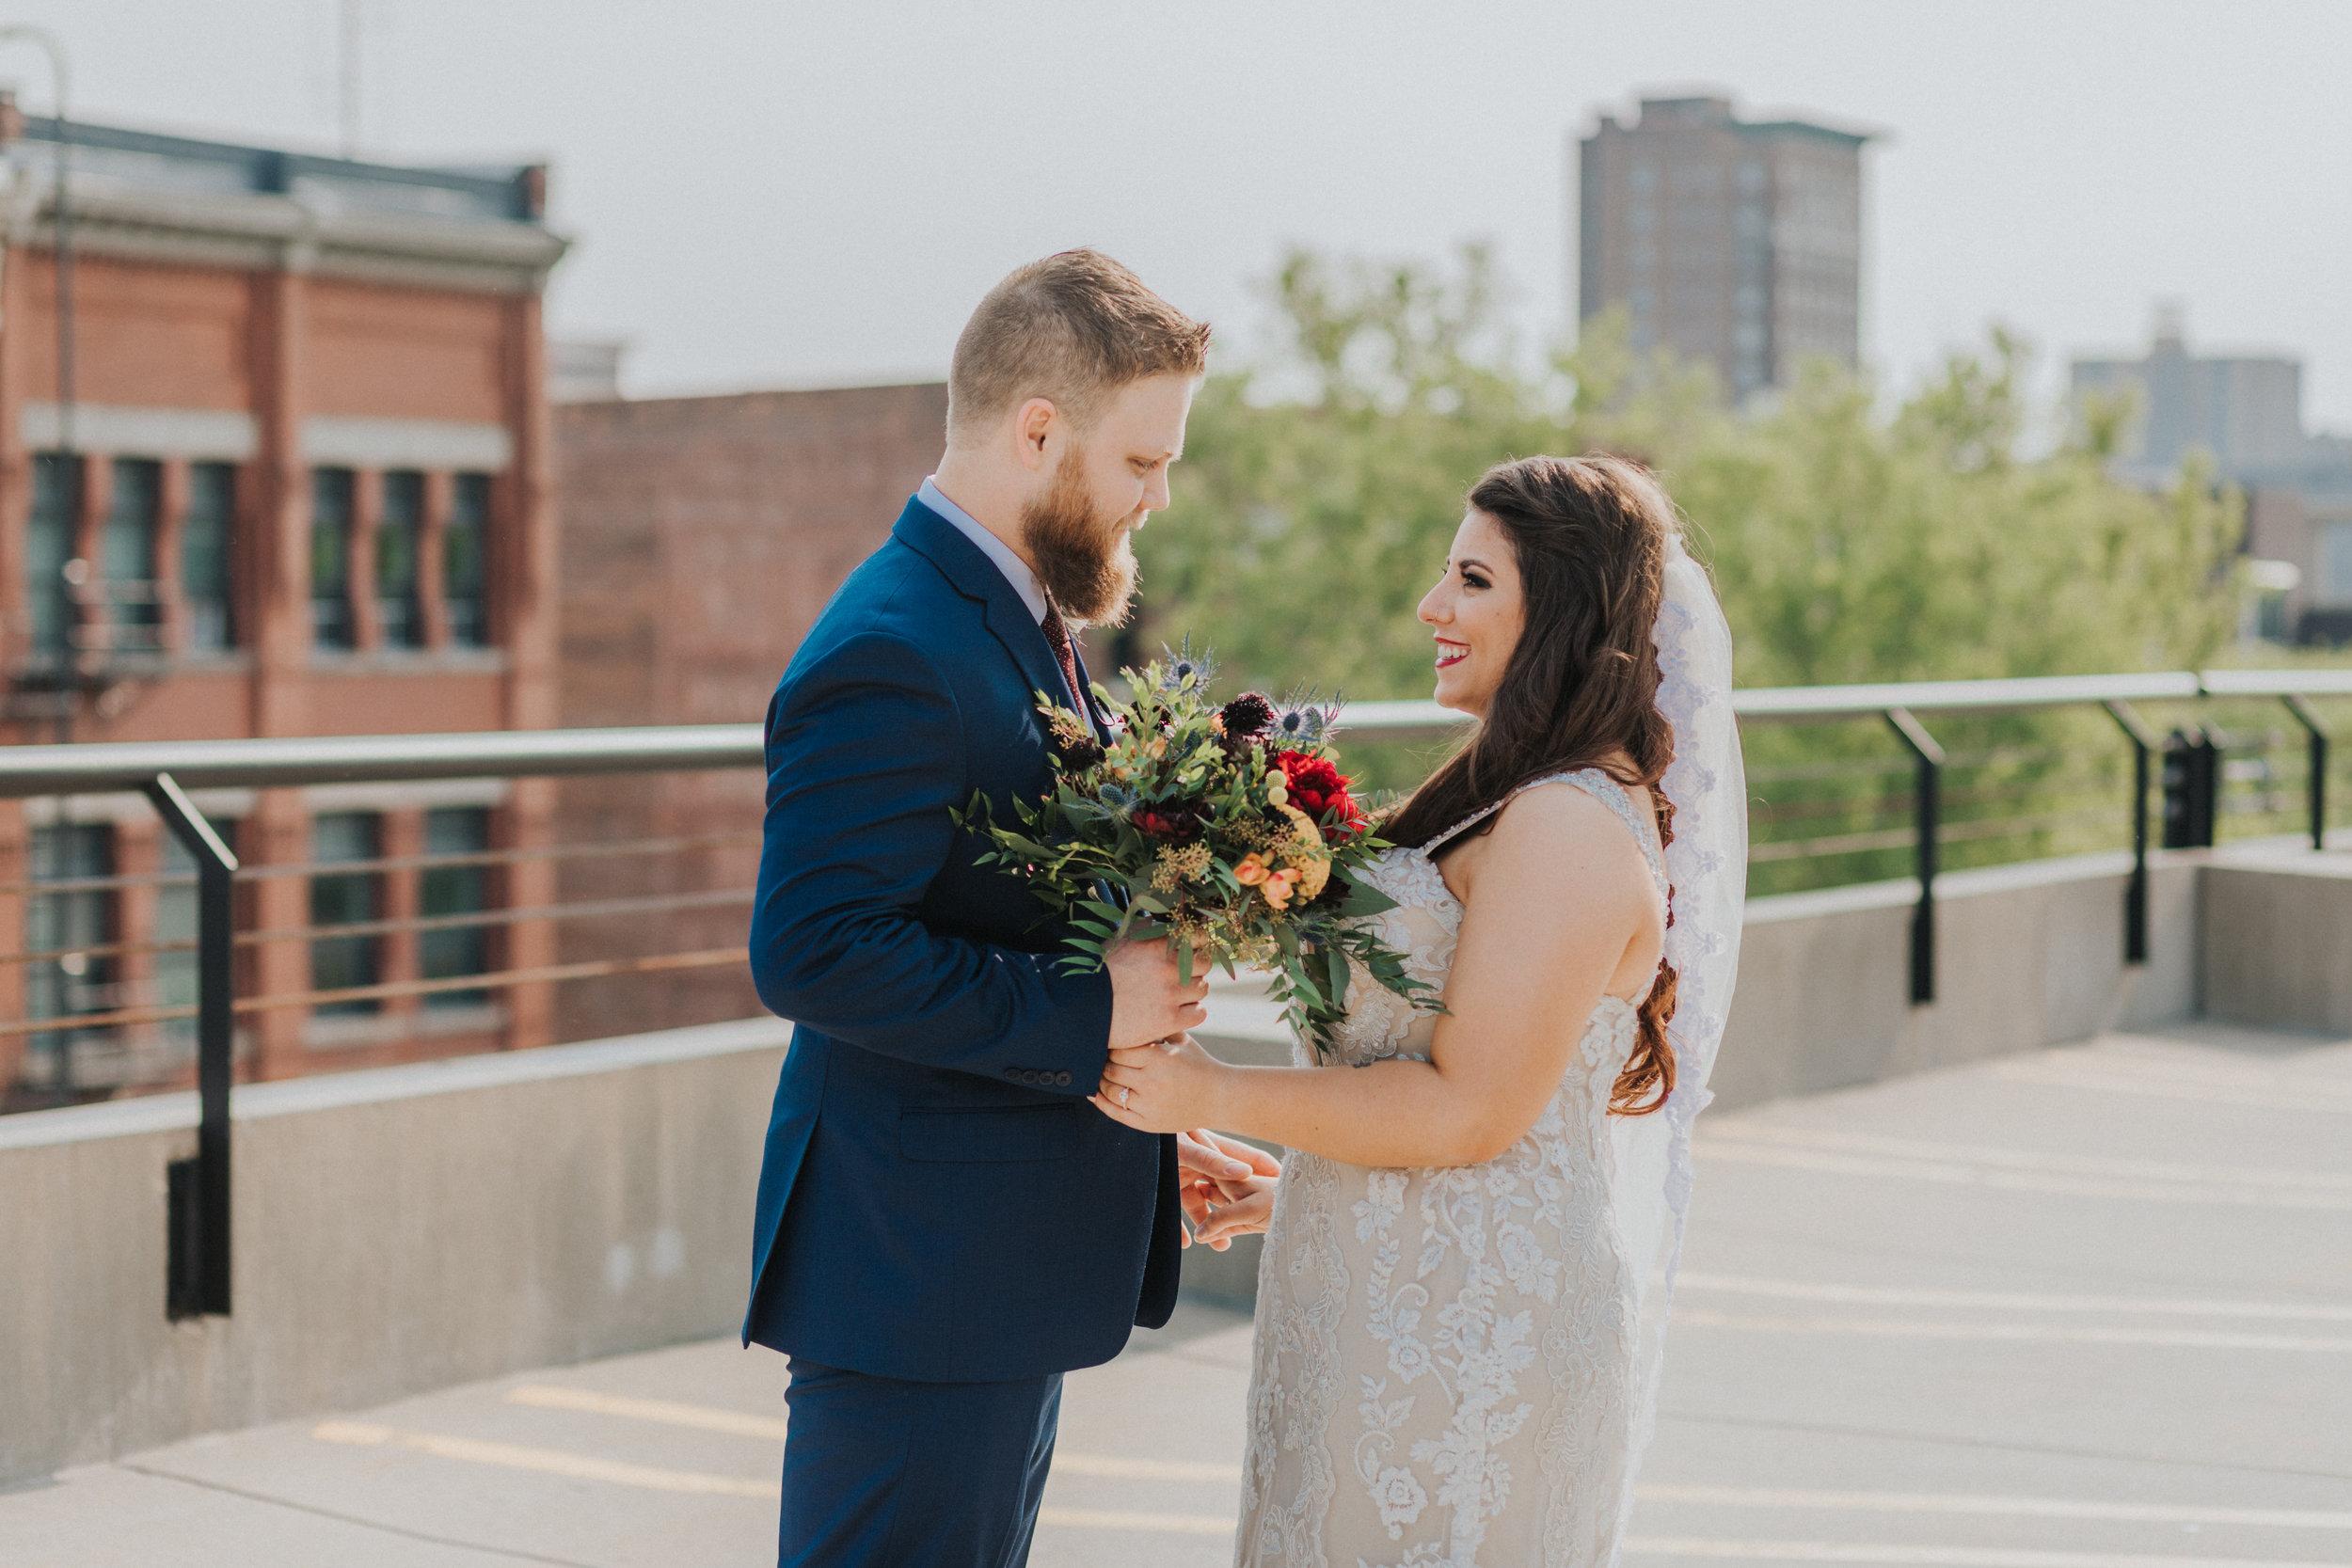 25omaha-old-market-intimate-summer-wedding-tiny-luxe-elopement.jpg